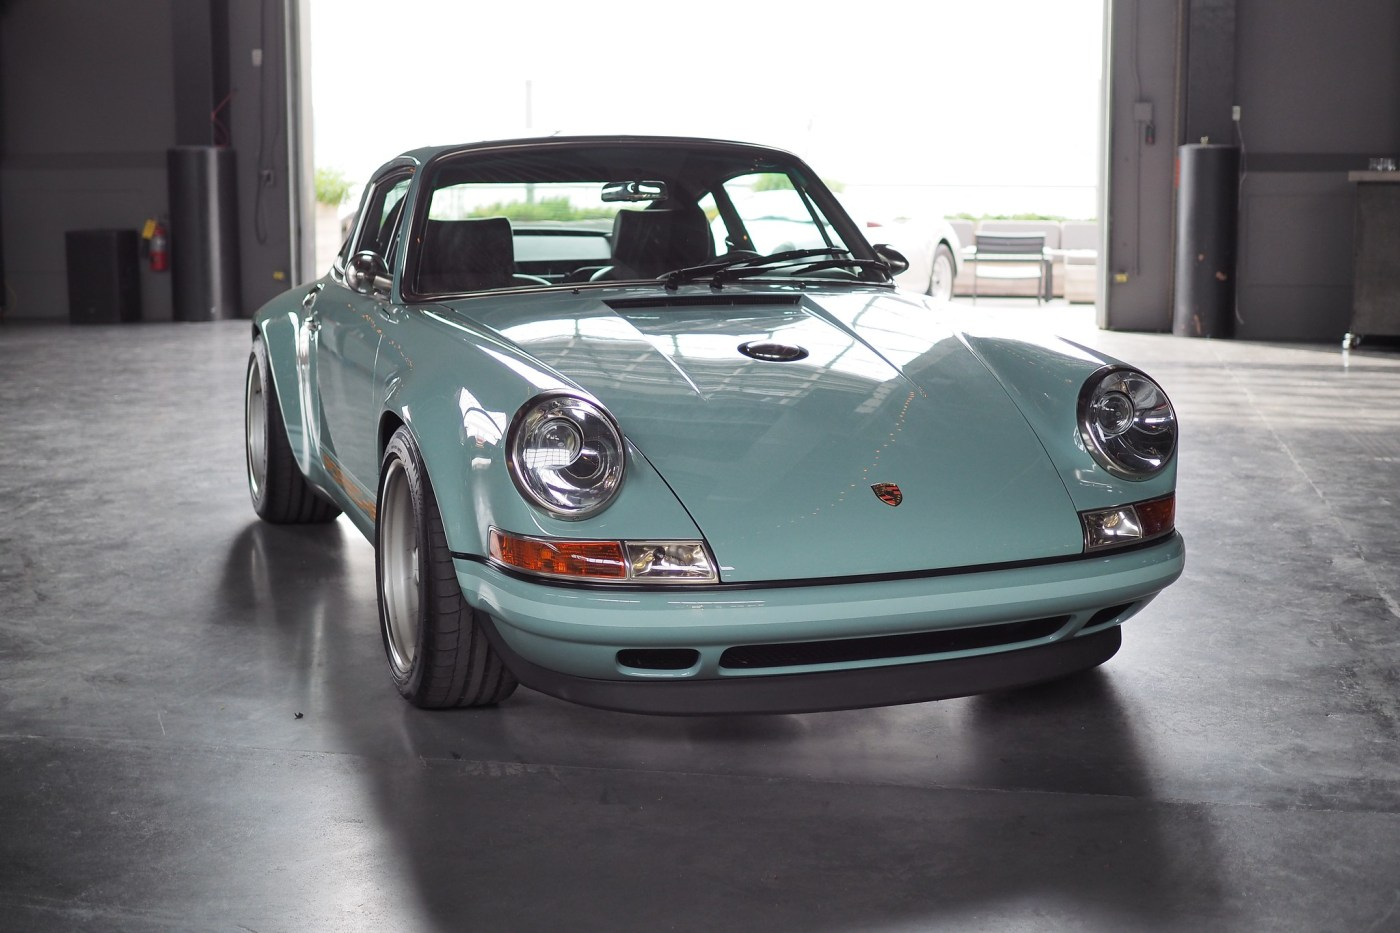 Singer Porsche 911 at Classic Car Club of Manhattan